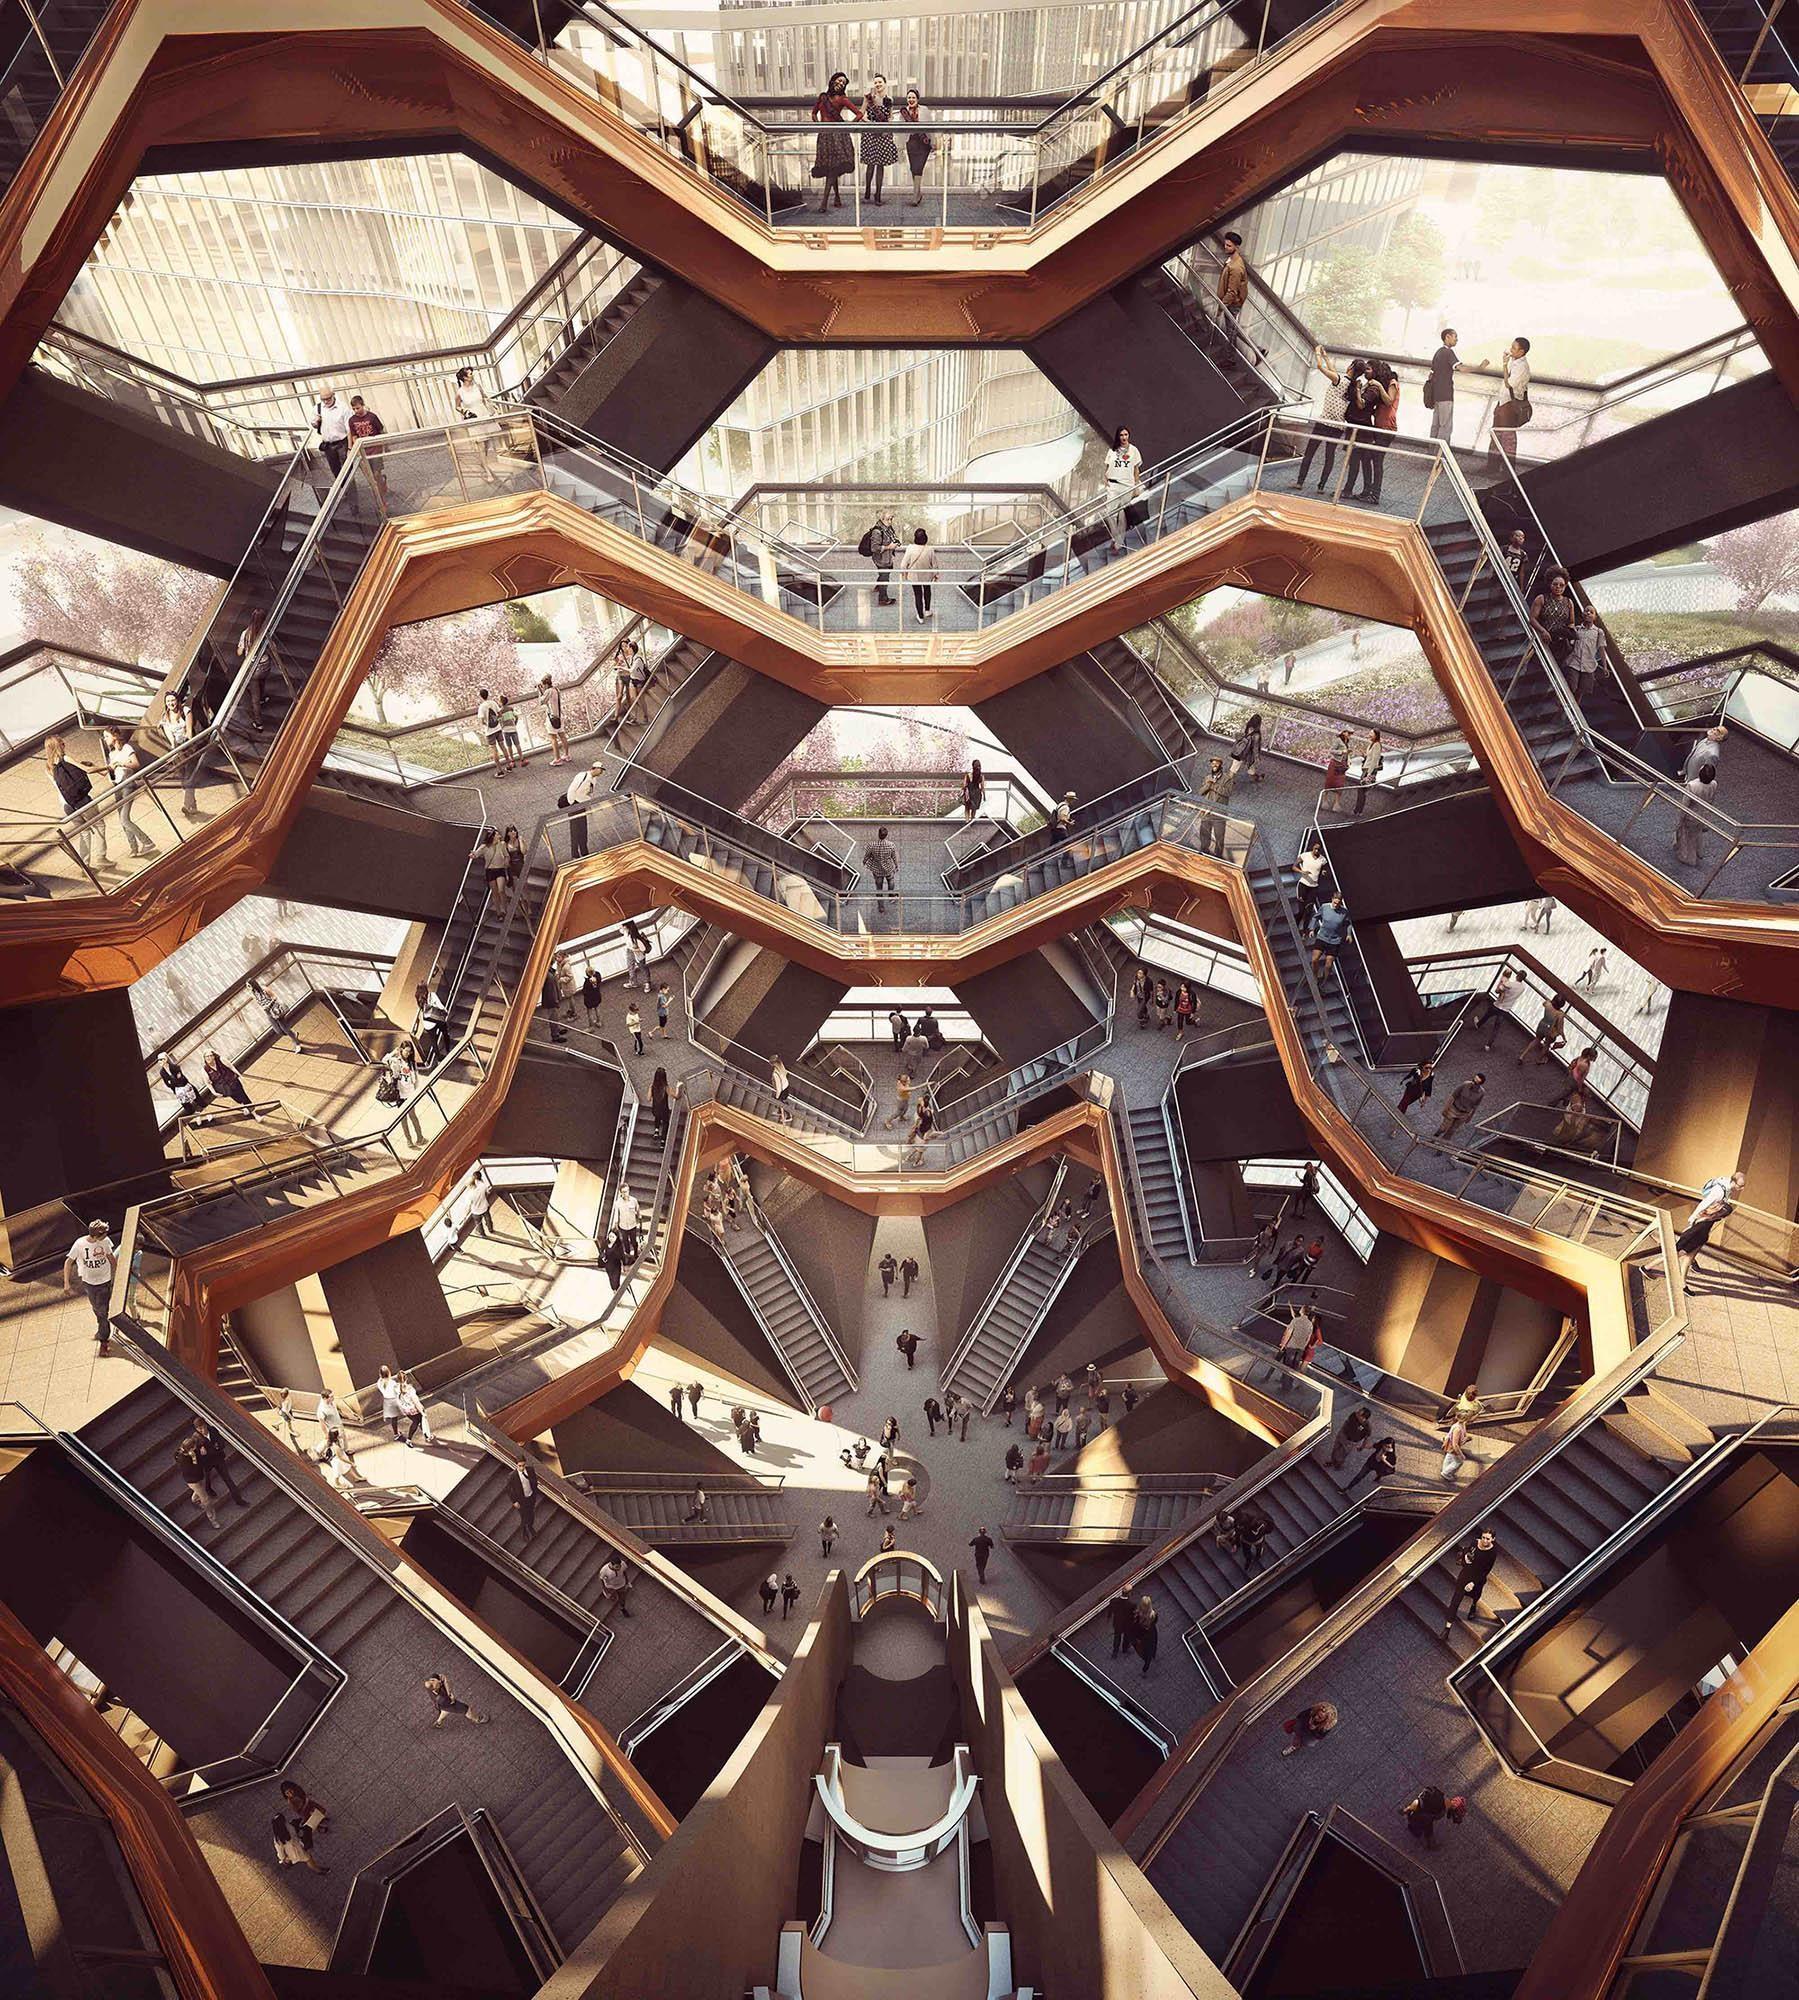 O edifício das escadas infinitas